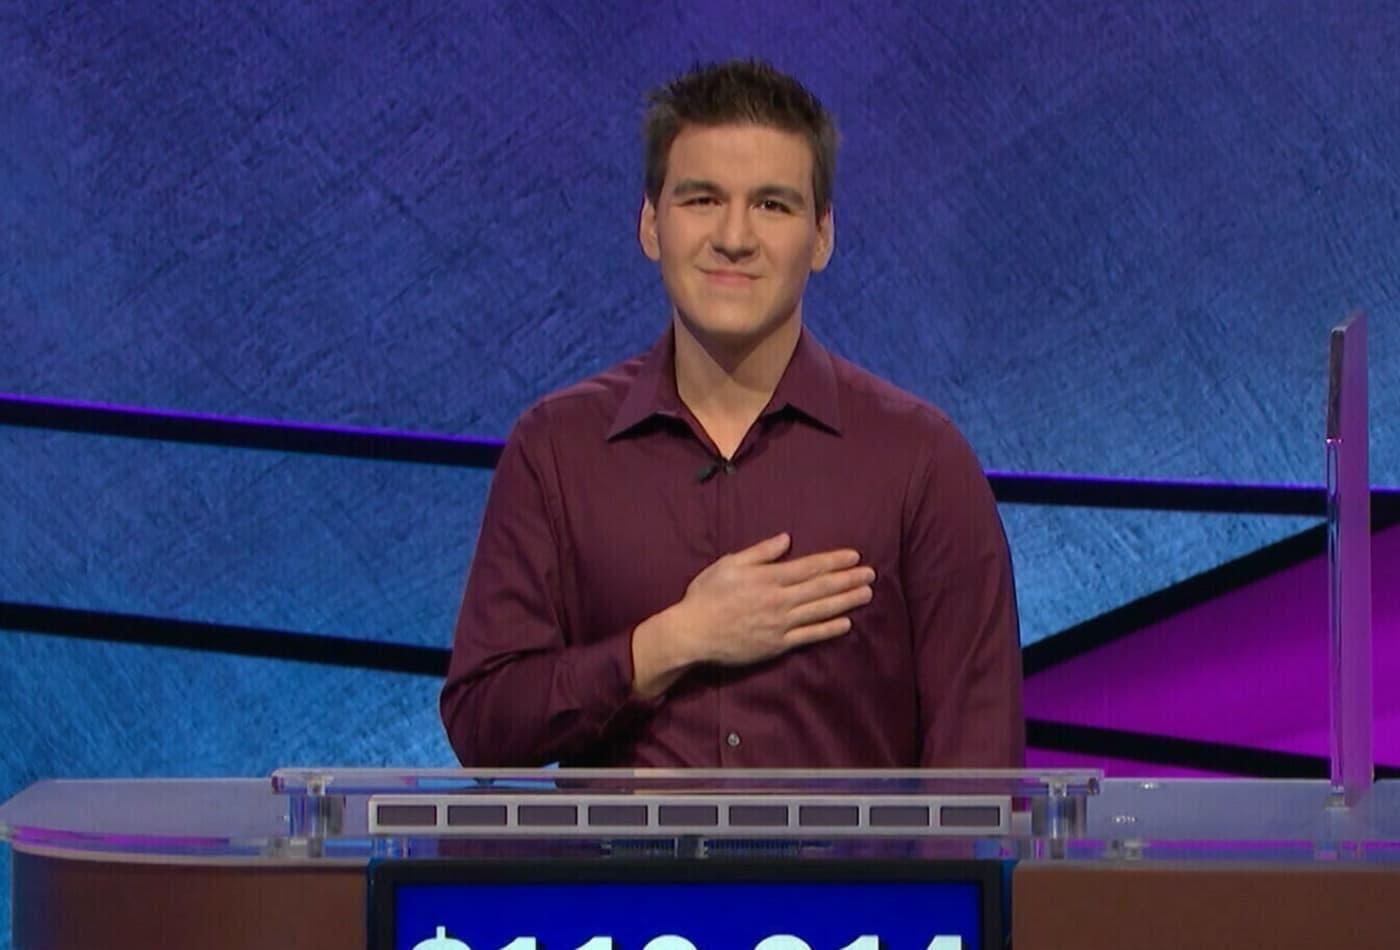 How Jeopardy! champ James Holzhauer has won over $1 million